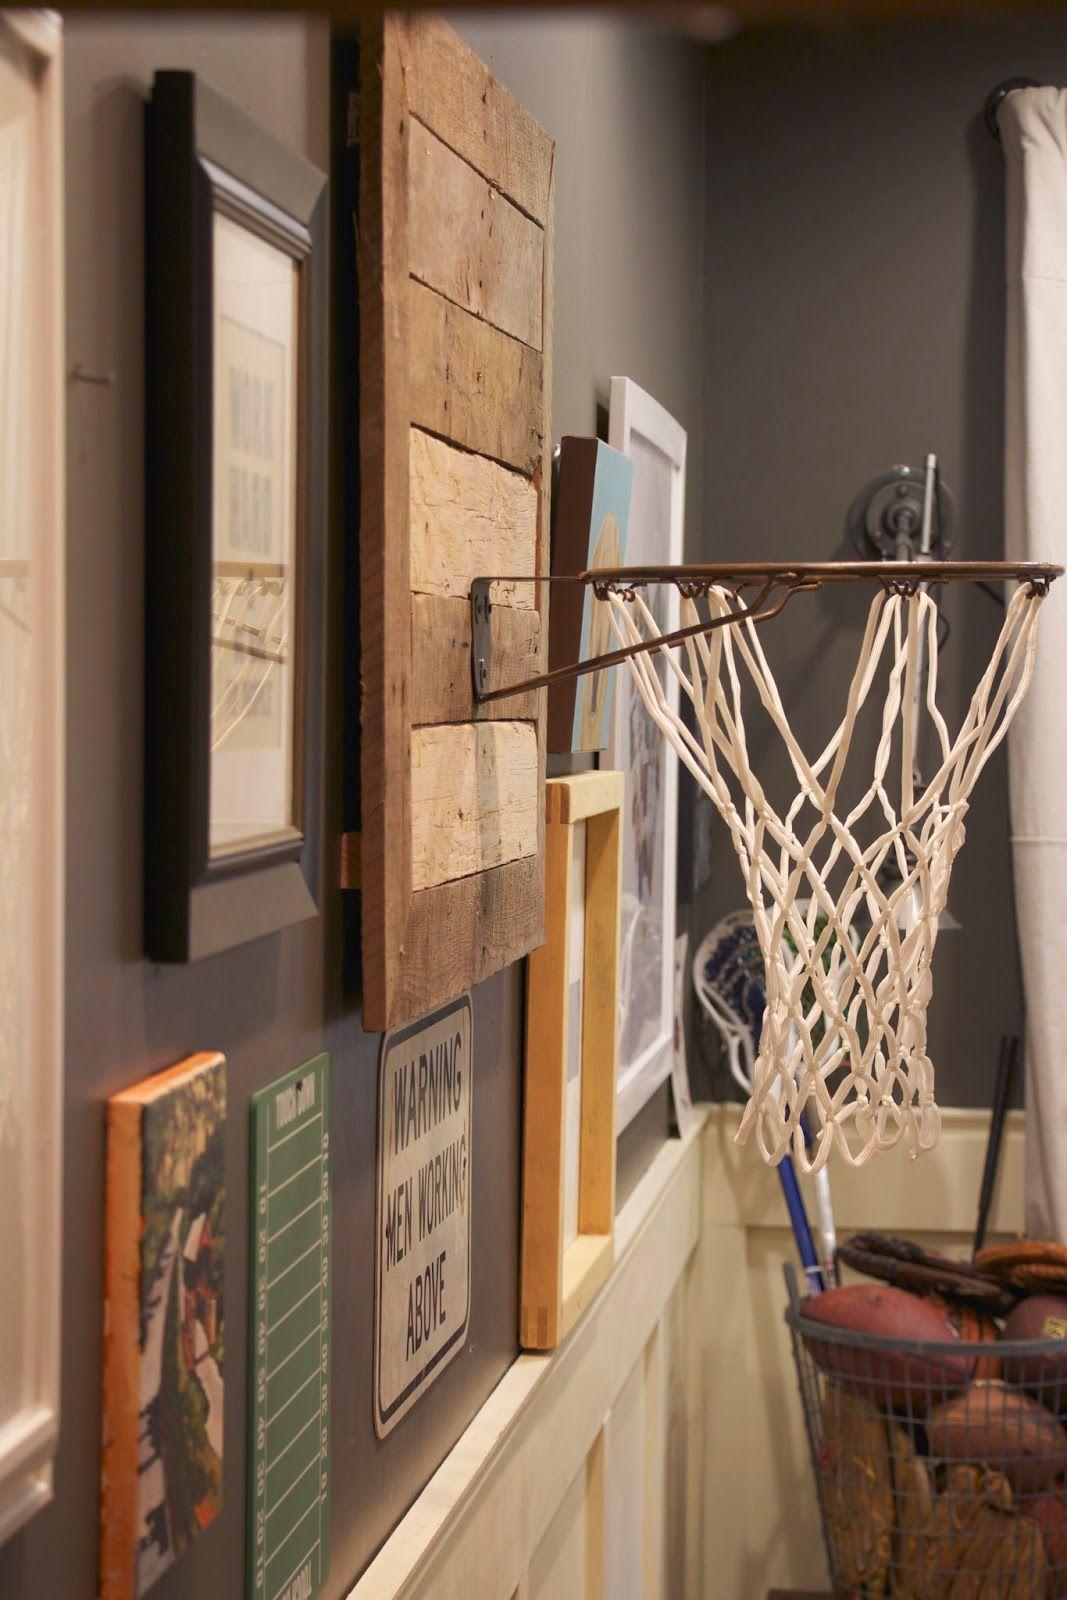 My Sweet Savannah thrifty Thursdaydiy basketball hoop